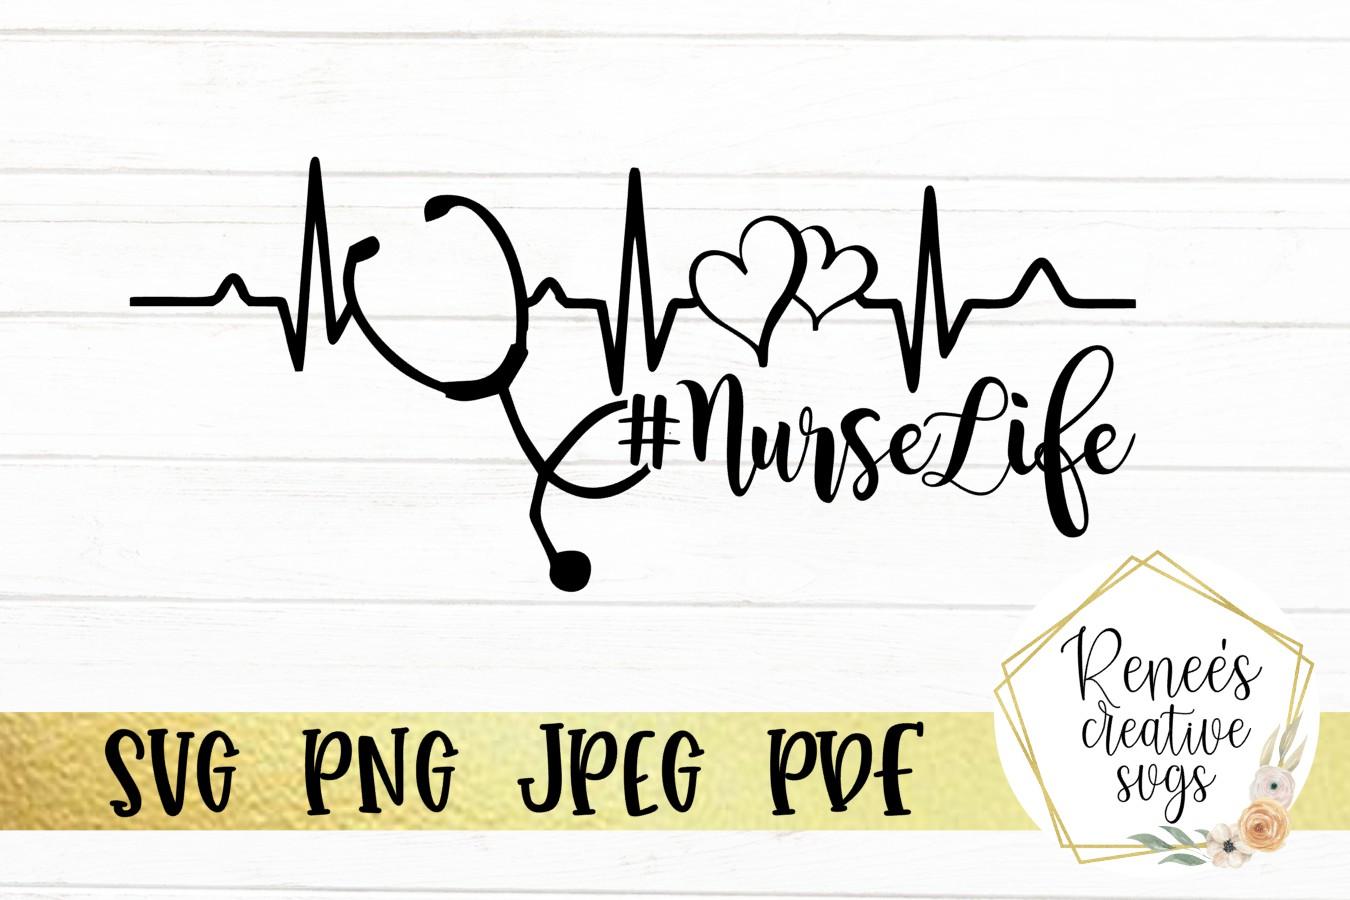 NurseLife | Nurse | SVG Cutting File example image 2